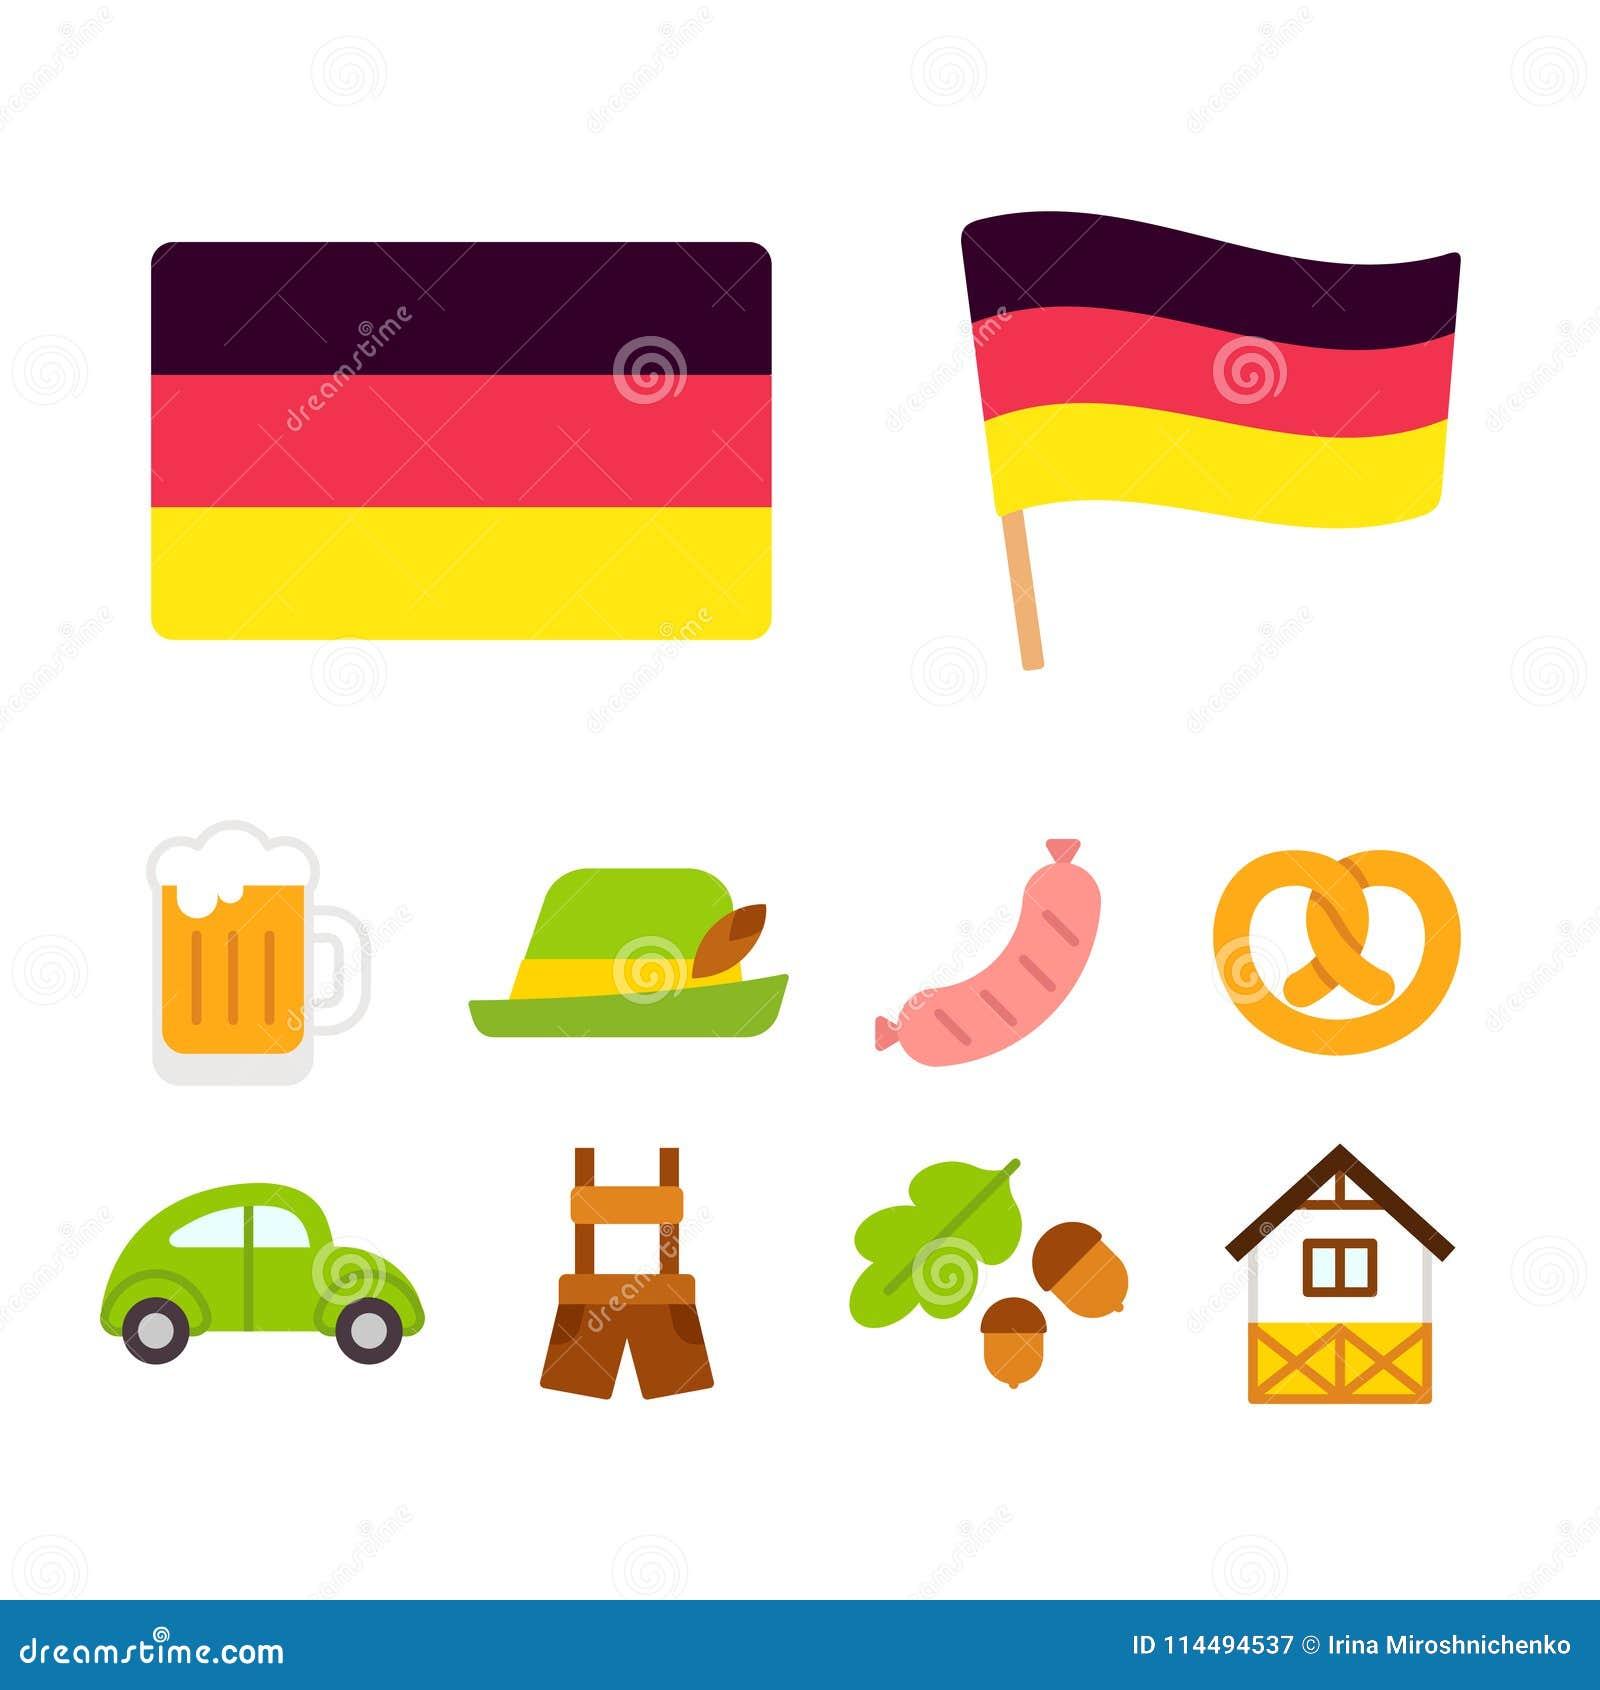 Germany Cartoon Icons Set Stock Vector Illustration Of Icon 114494537